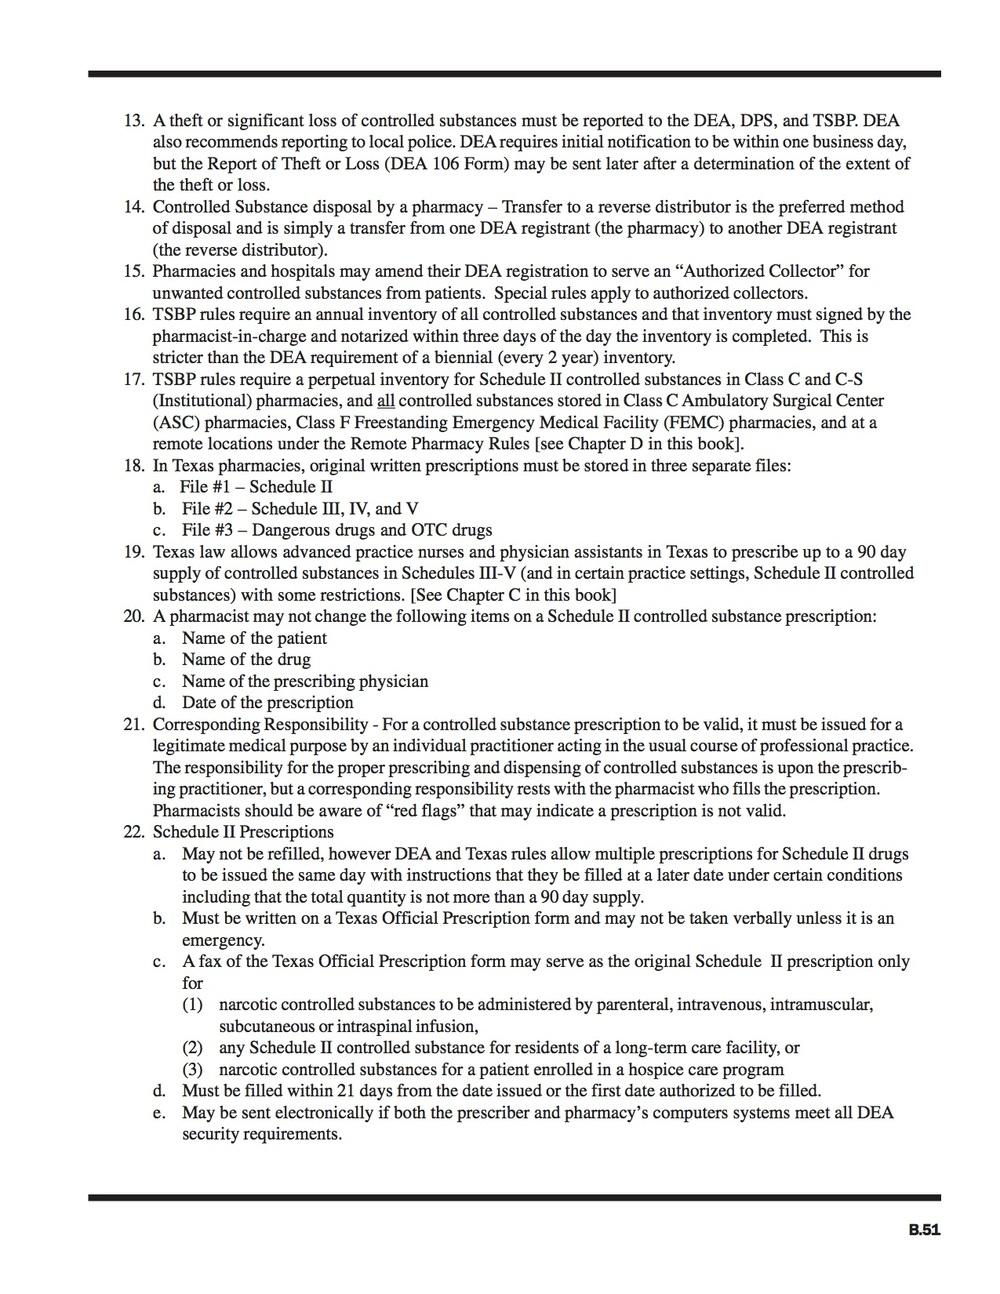 Chapter B_Draft-2 51.jpg